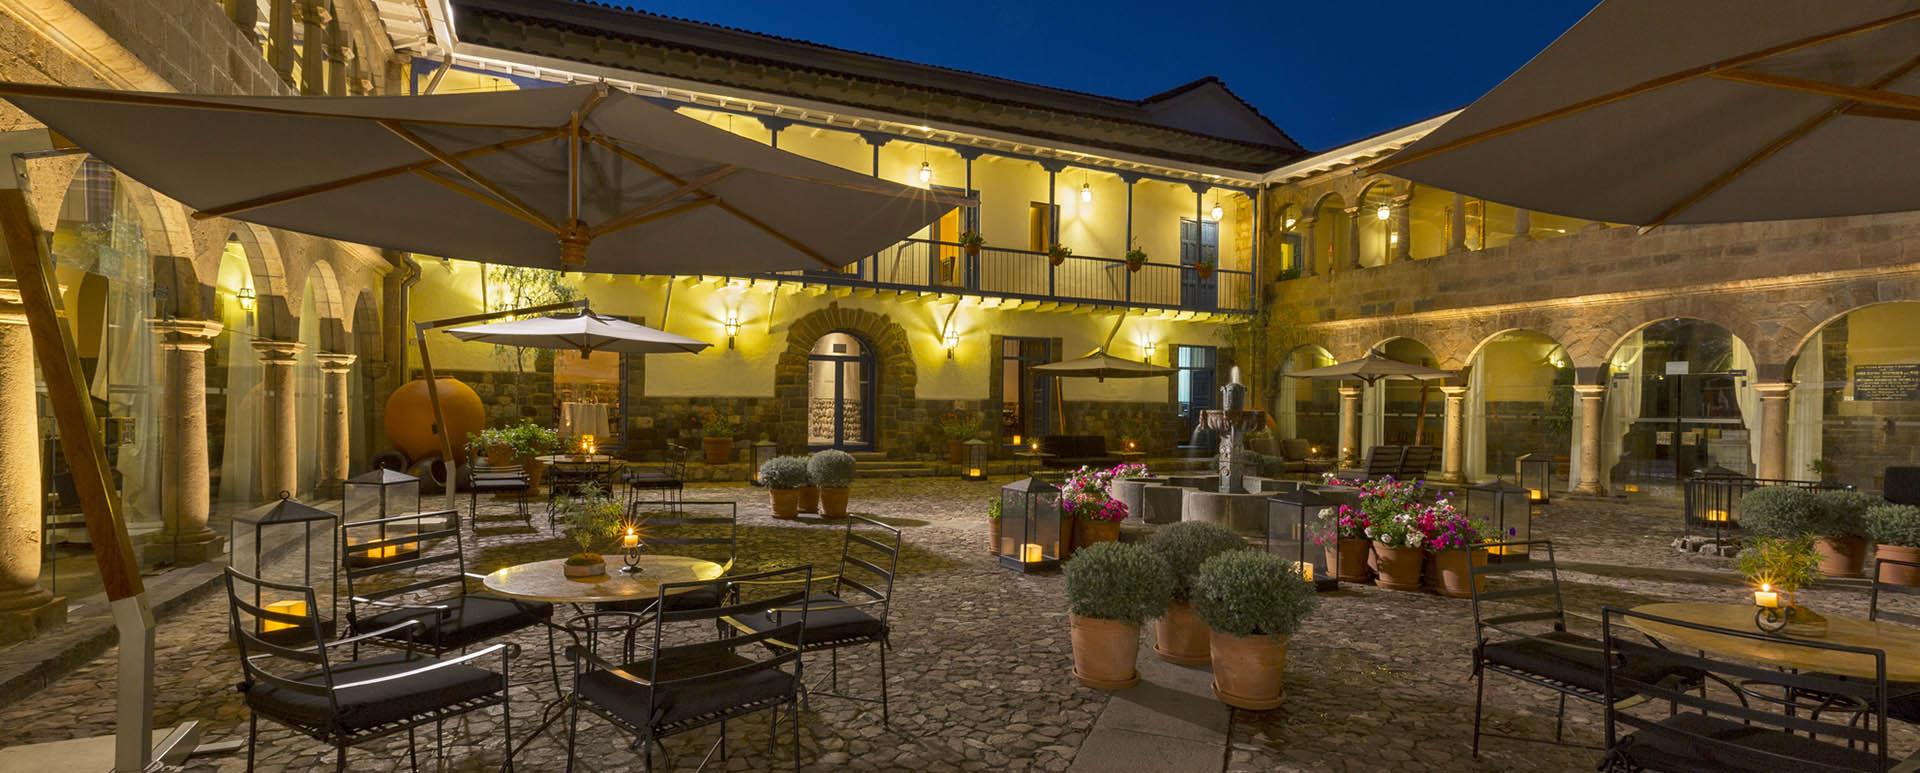 Palacio del Inka courtyard